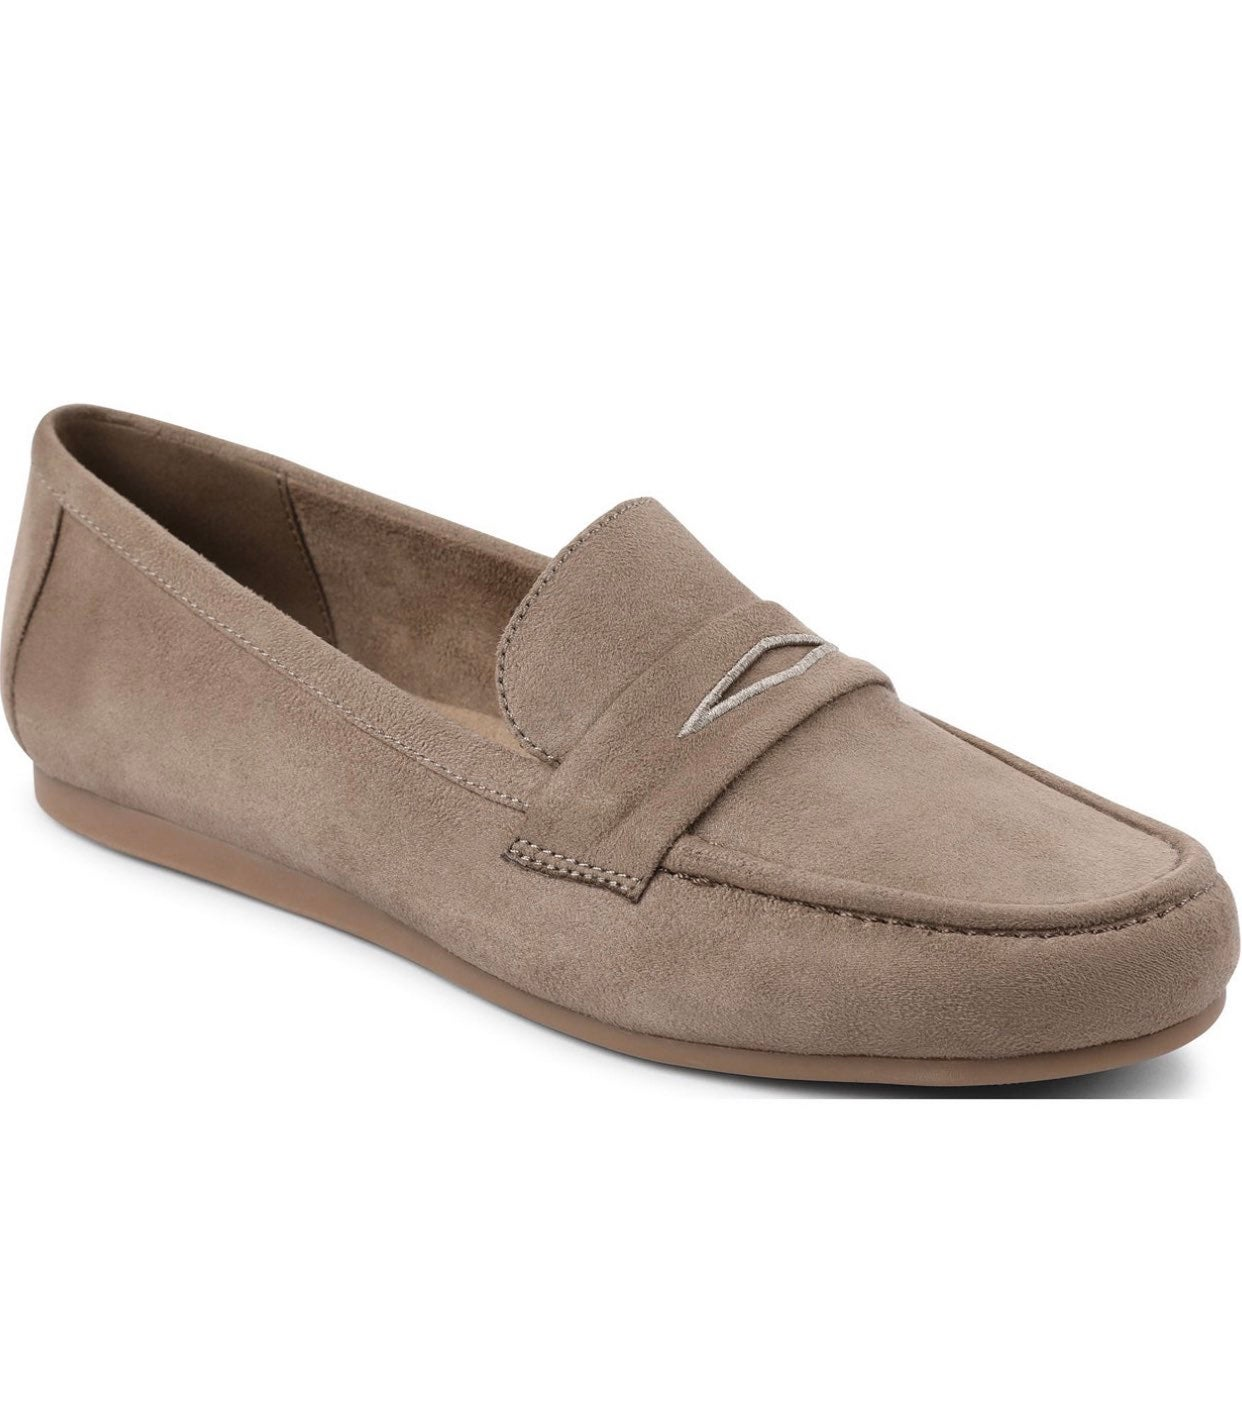 XOXO flat sandals size 10